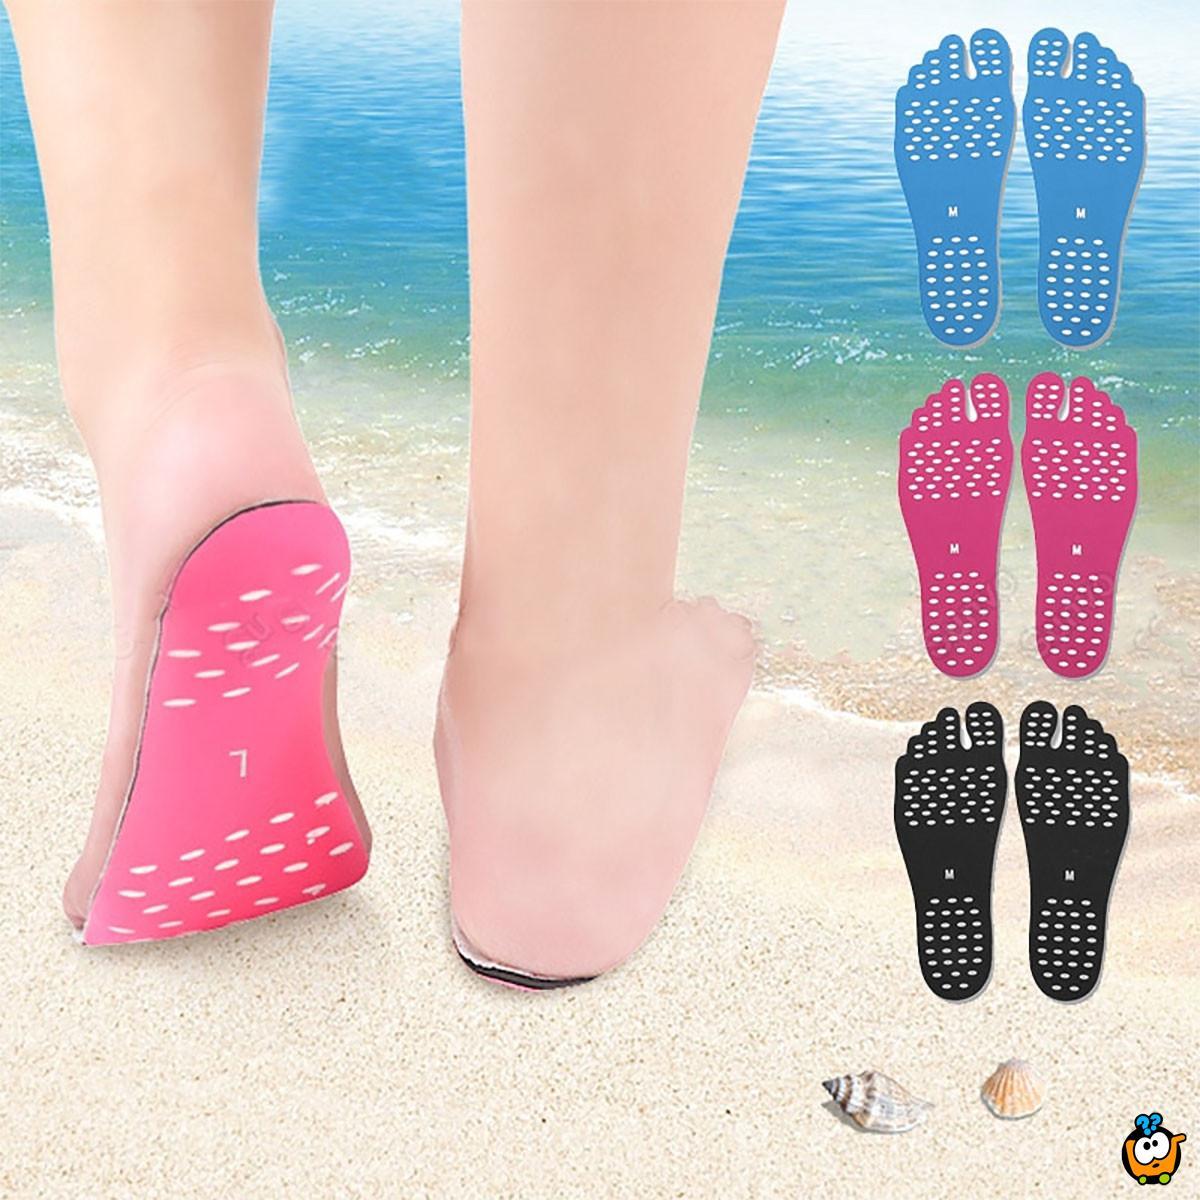 Vodootporni silikonski ulošci za zaštitu stopala